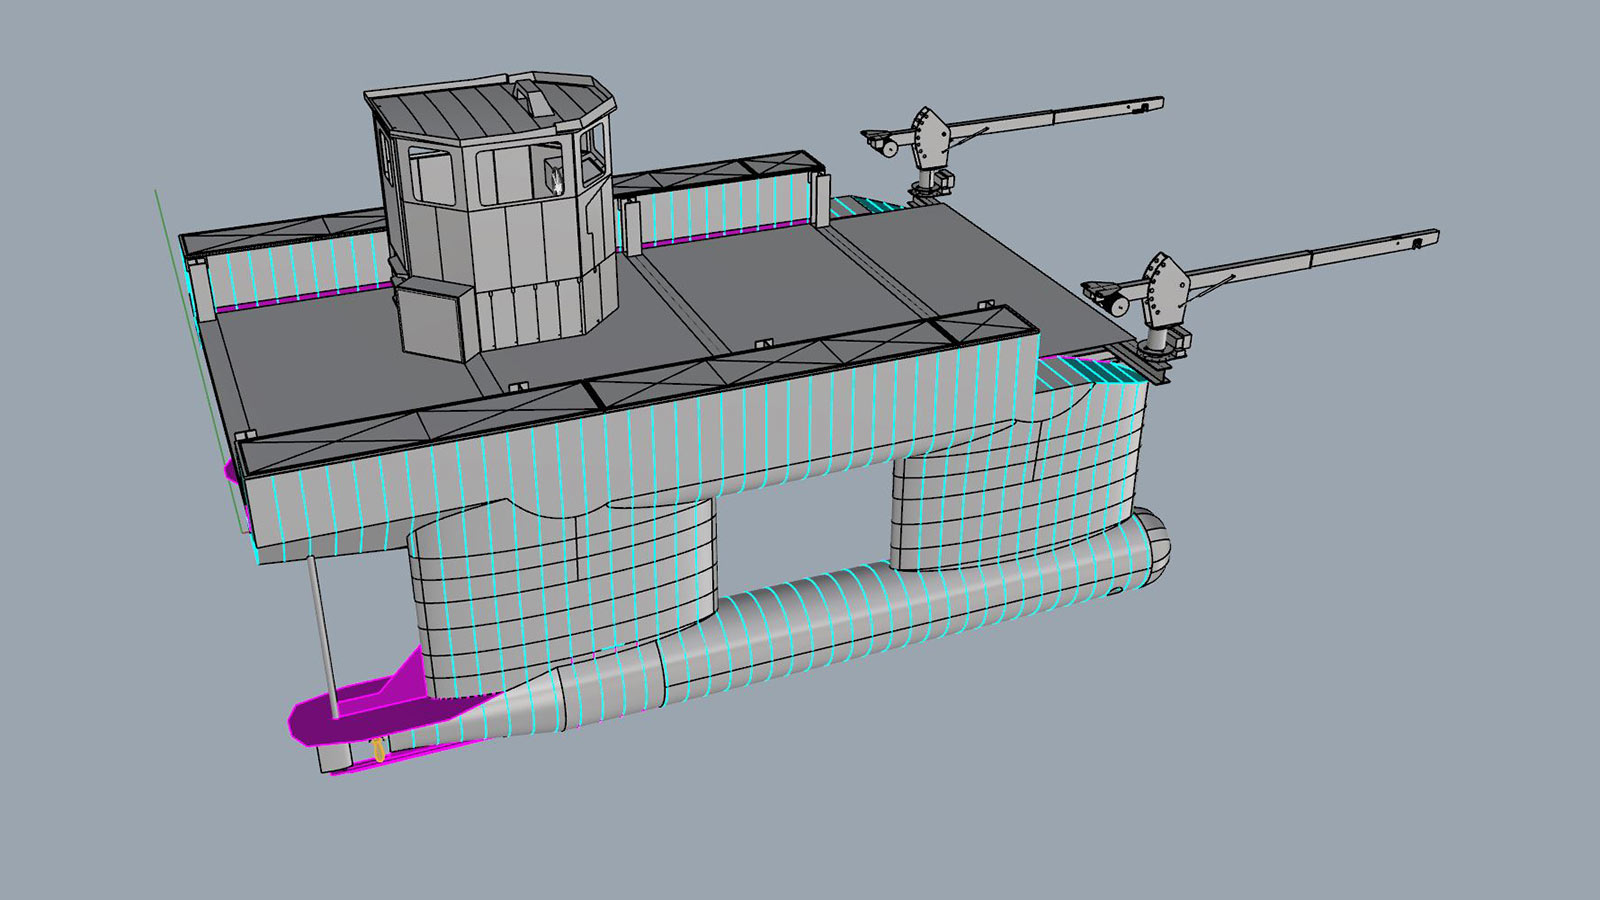 AluminiumJon - GolfVessel - SlowMill - Supportboot